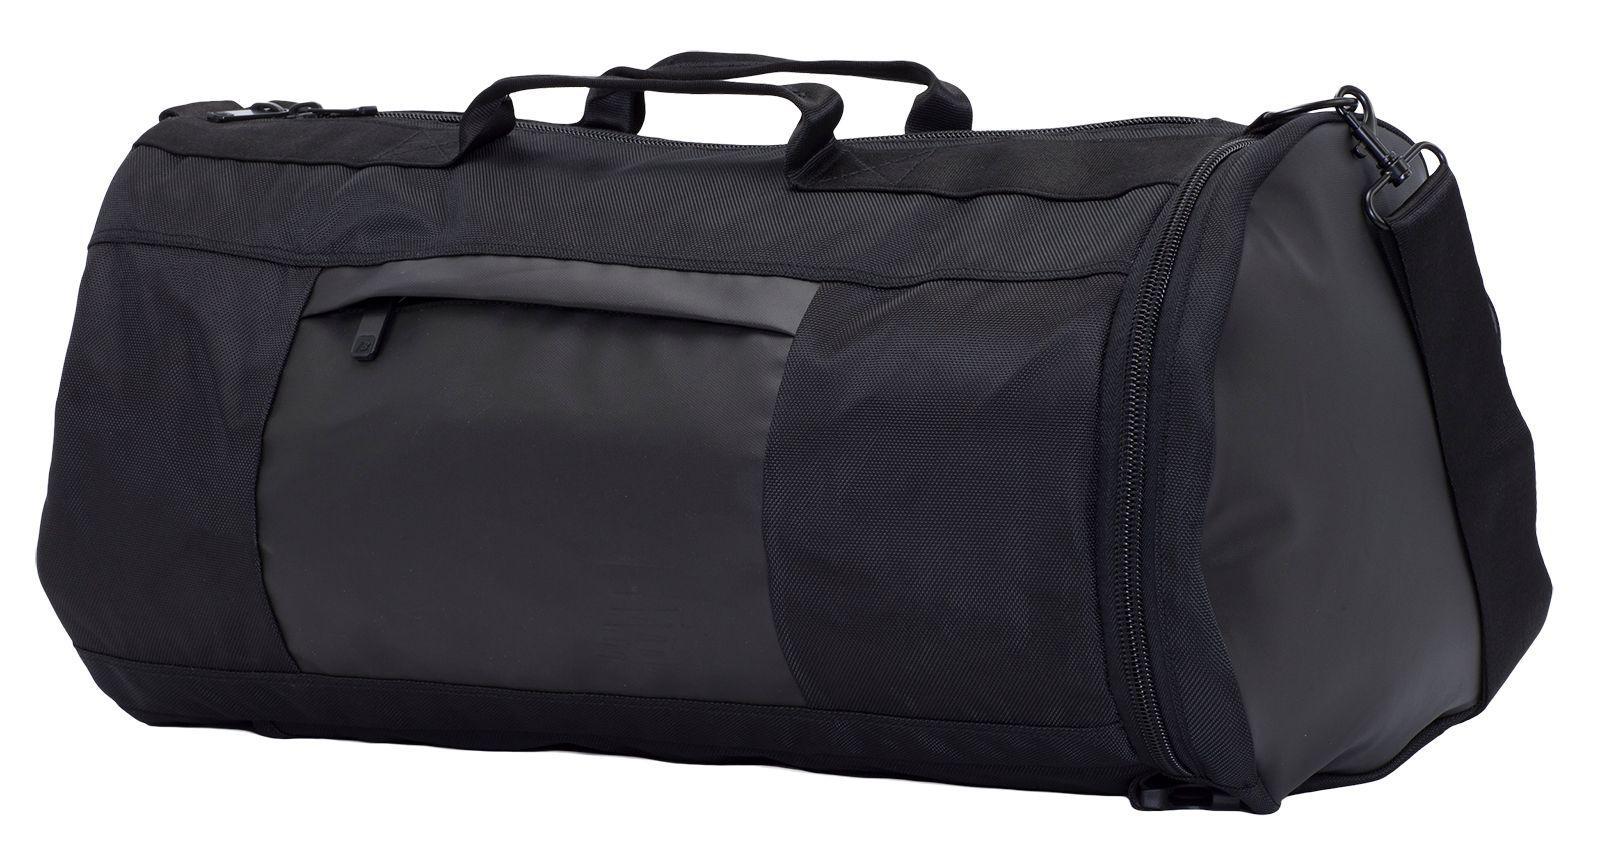 Lyst - New Balance Omni Convertible Duffel in Black for Men d3d2b56fef78e